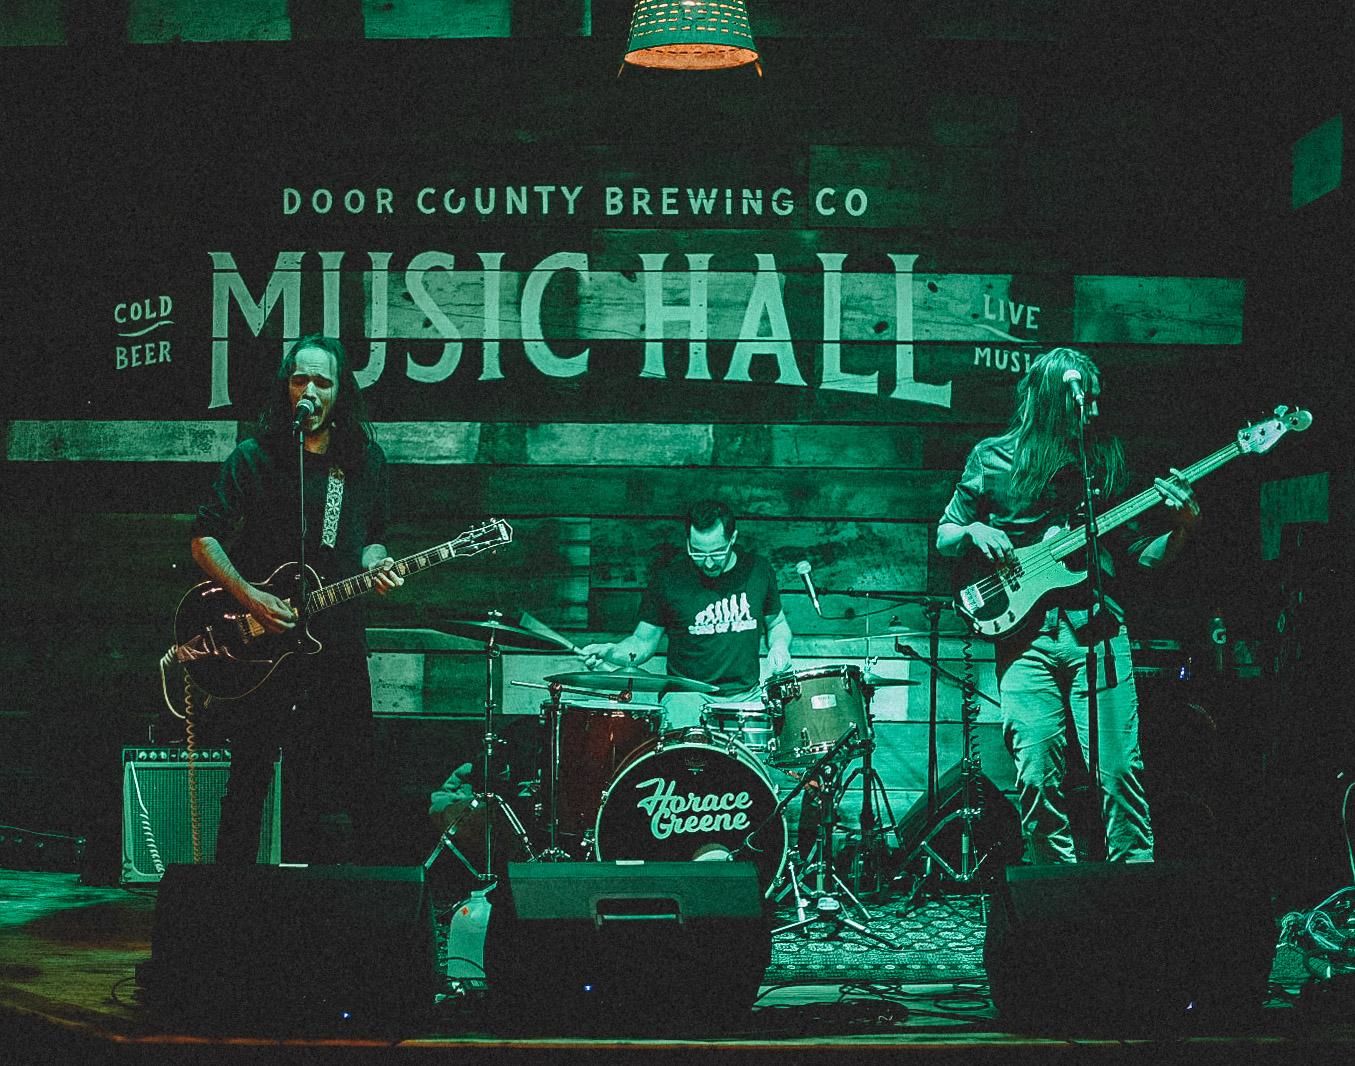 Door-County-Brewing-Co-Taproom-Music-Hall-Horace-Greene-1-2.jpg